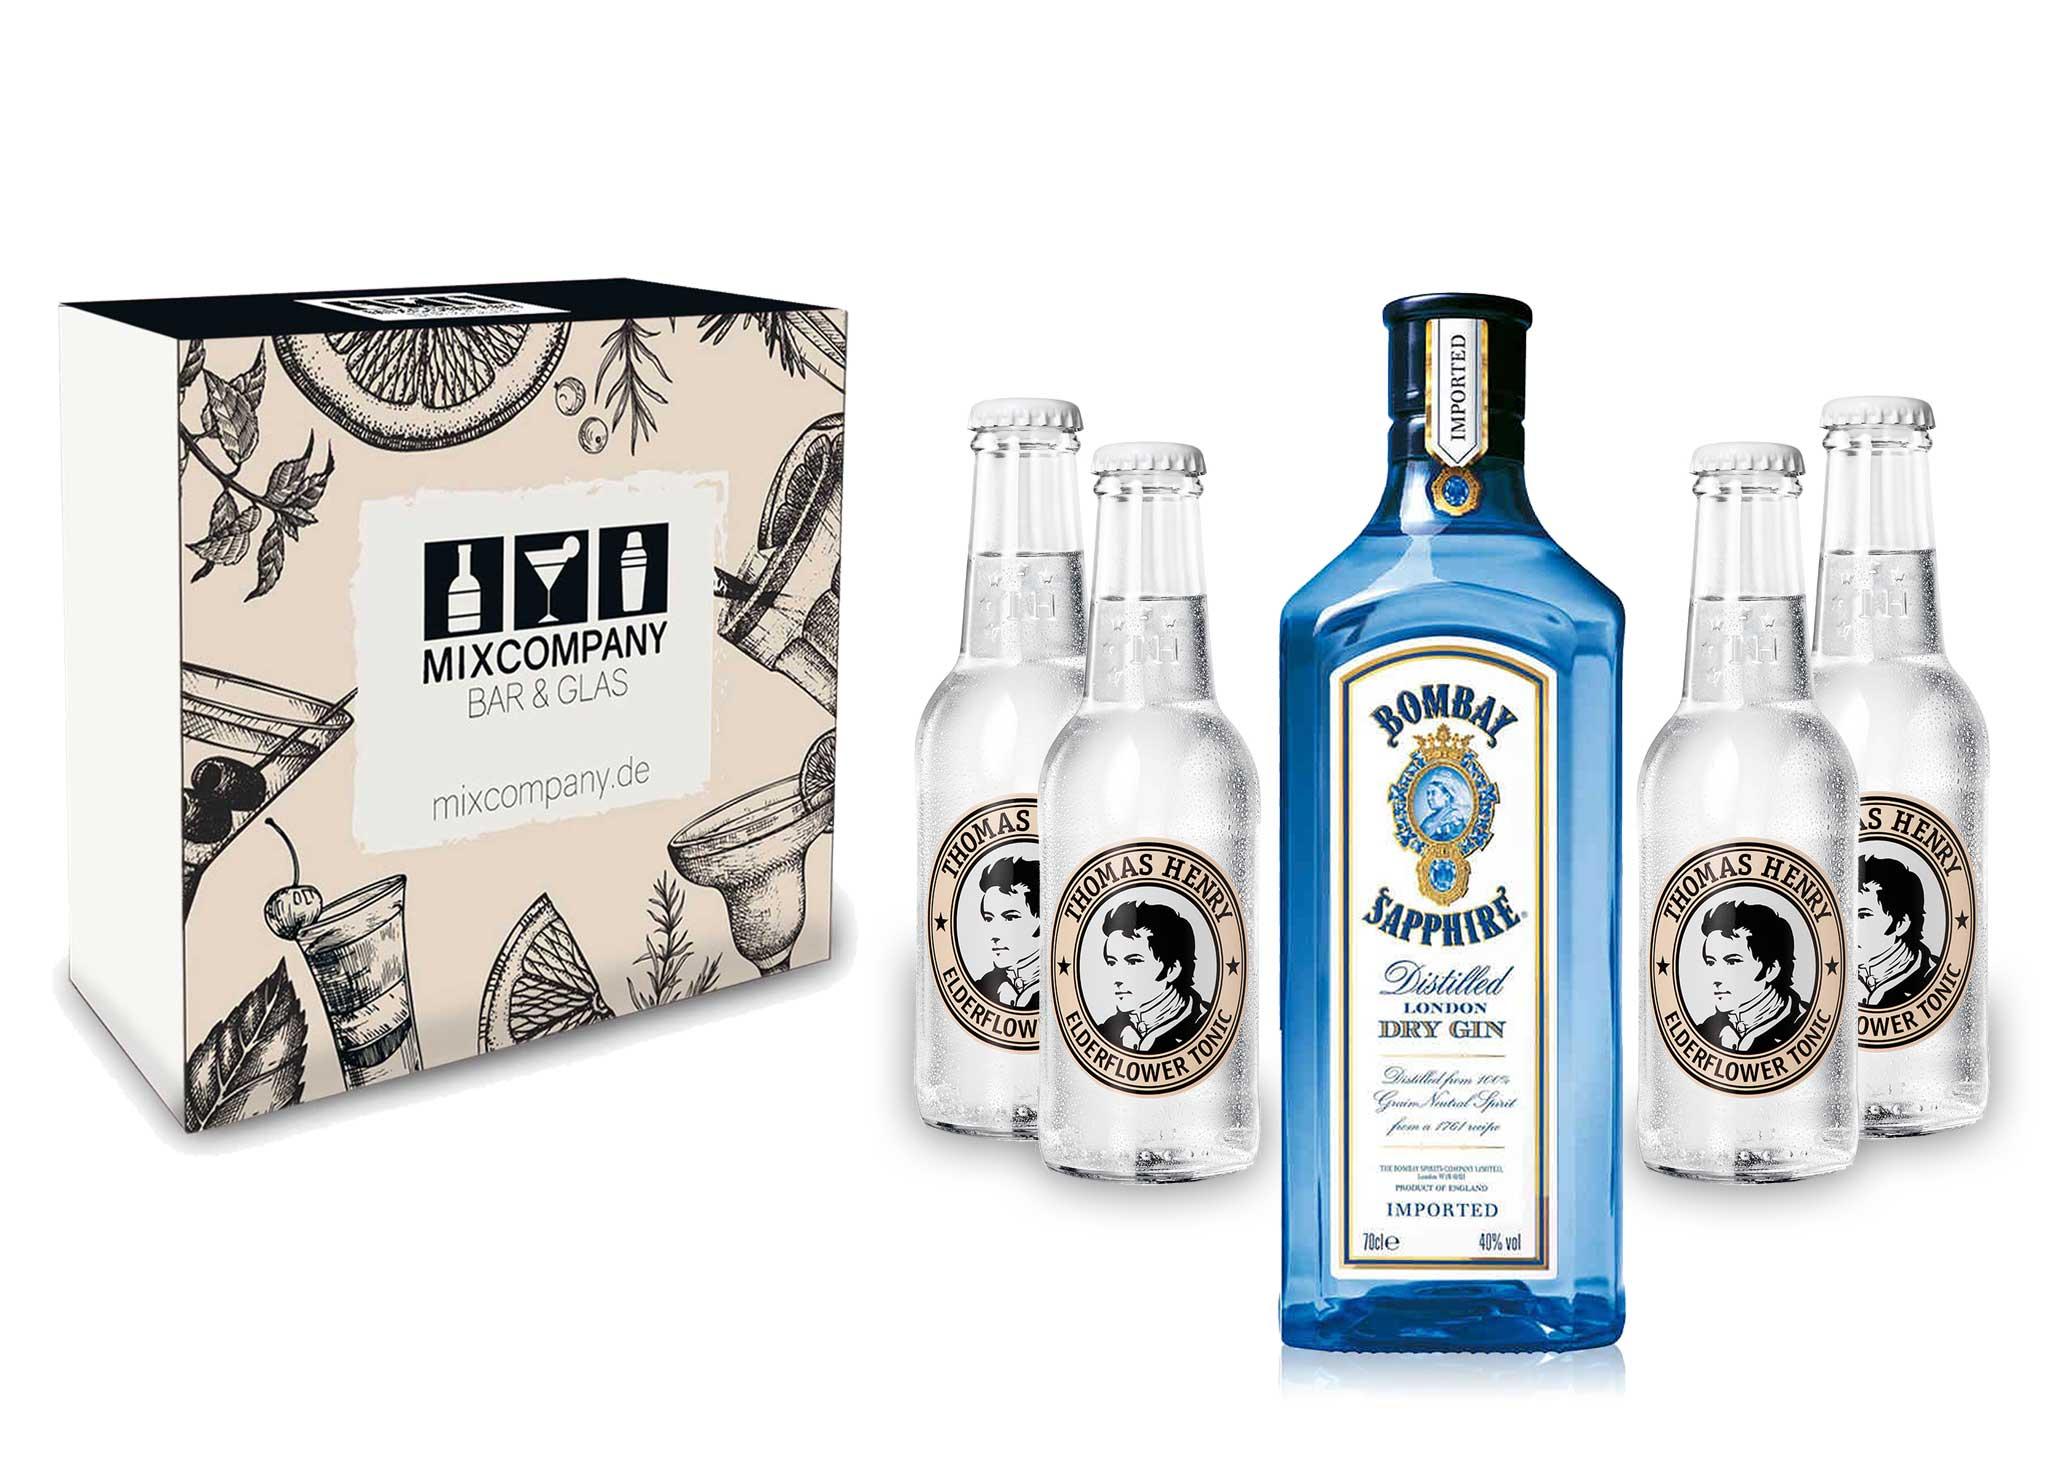 Gin Tonic Giftbox Geschenkset - Bombay Sapphire 0,7l 700ml (40% Vol) + 4x Thomas Henry Elderflower Tonic Water 200ml inkl. Pfand MEHRWEG + Geschenkverpackung